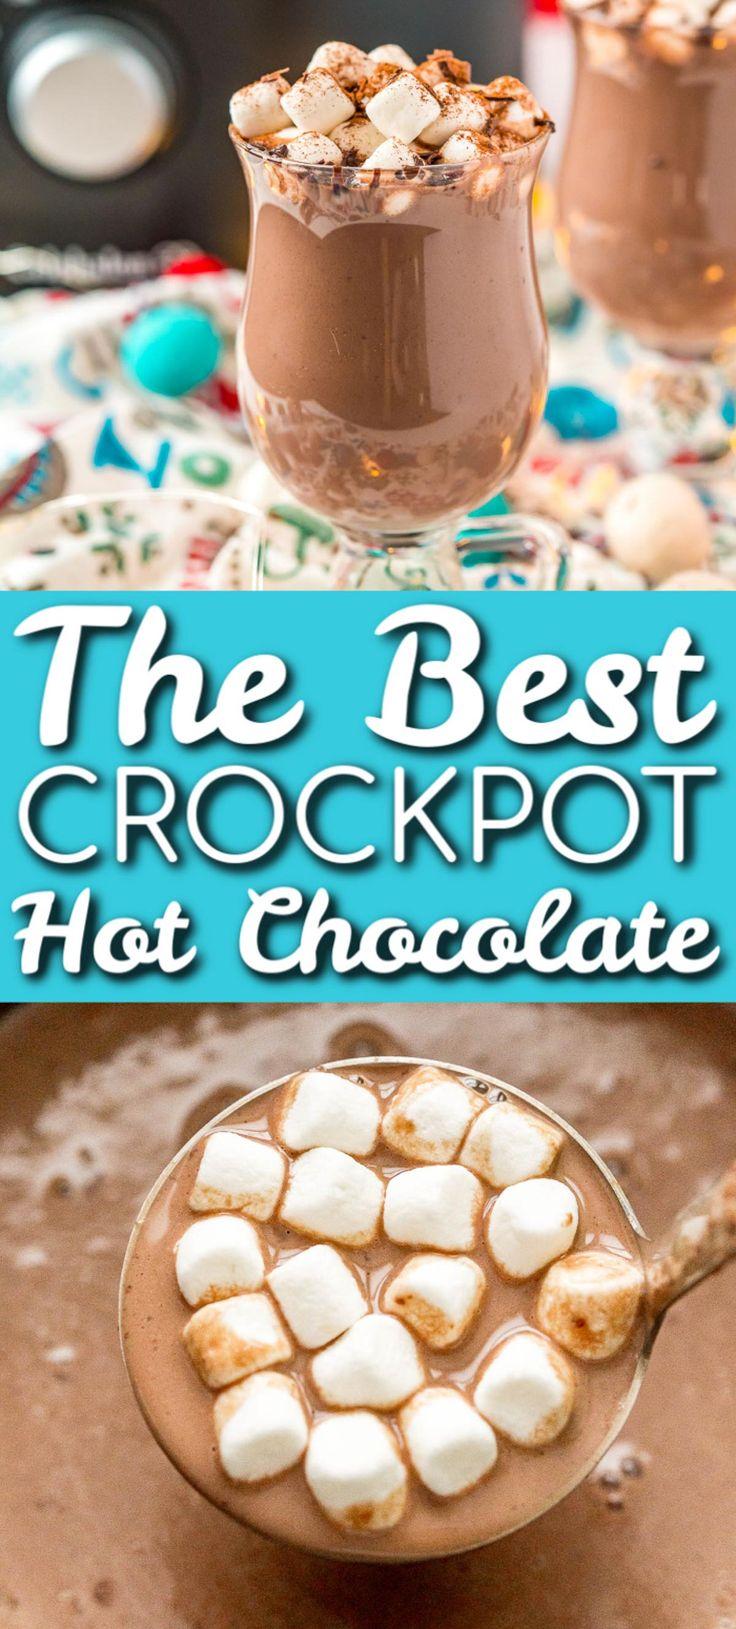 Crockpot hot chocolate is made with heavy cream milk